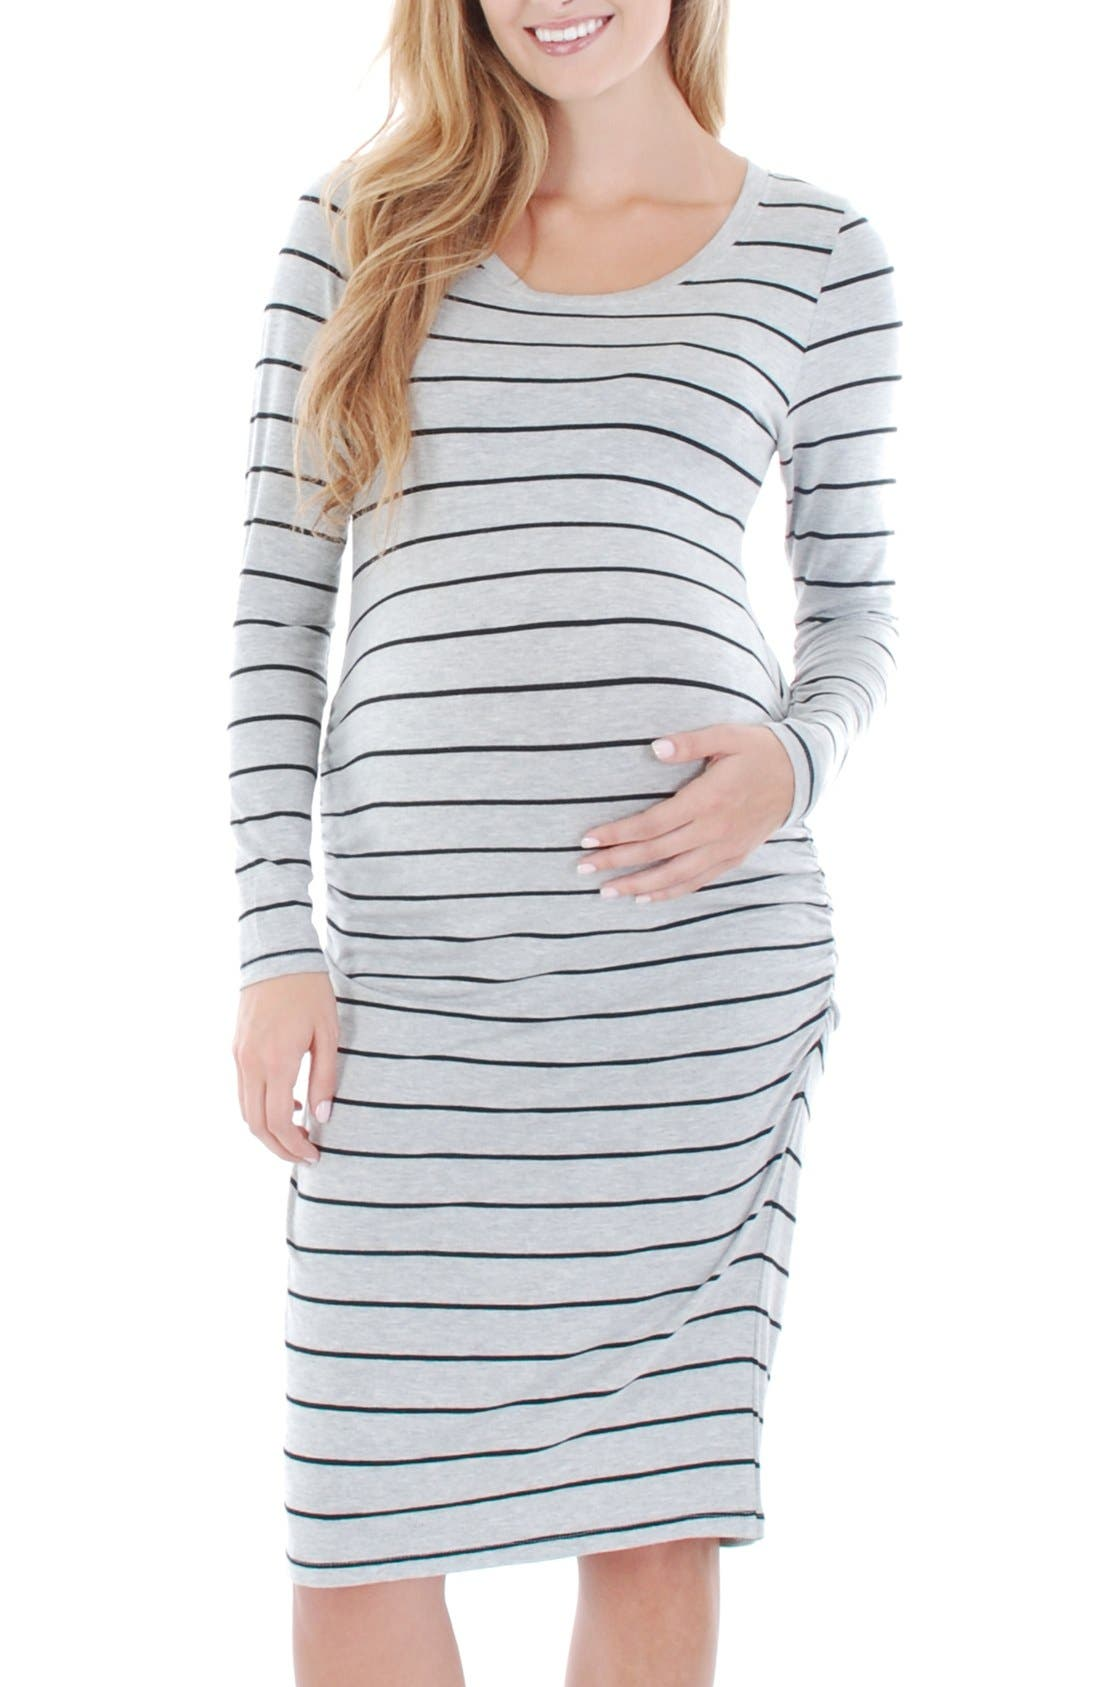 EverlyGrey 'Hanh' Maternity T-Shirt Dress